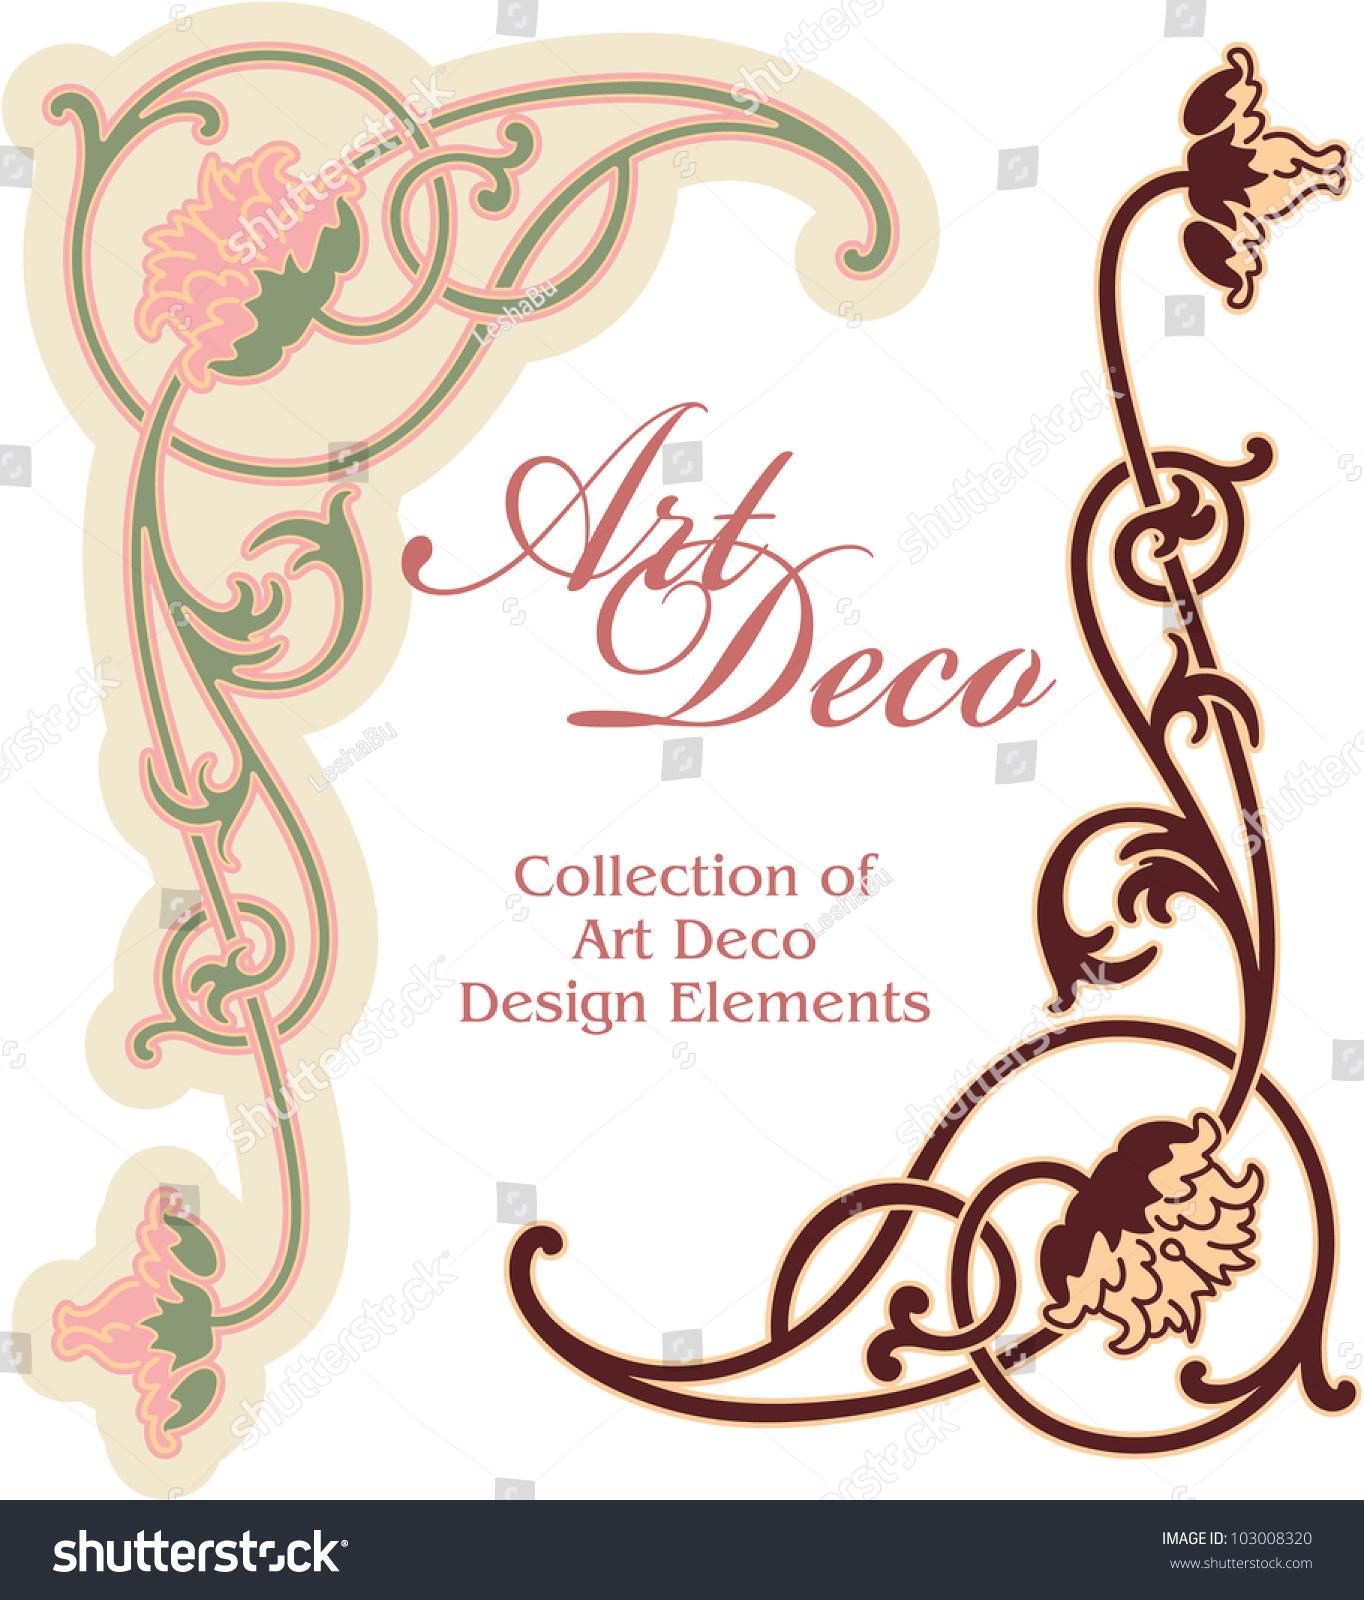 Art deco design element corner stock vector illustratie for Element deco design